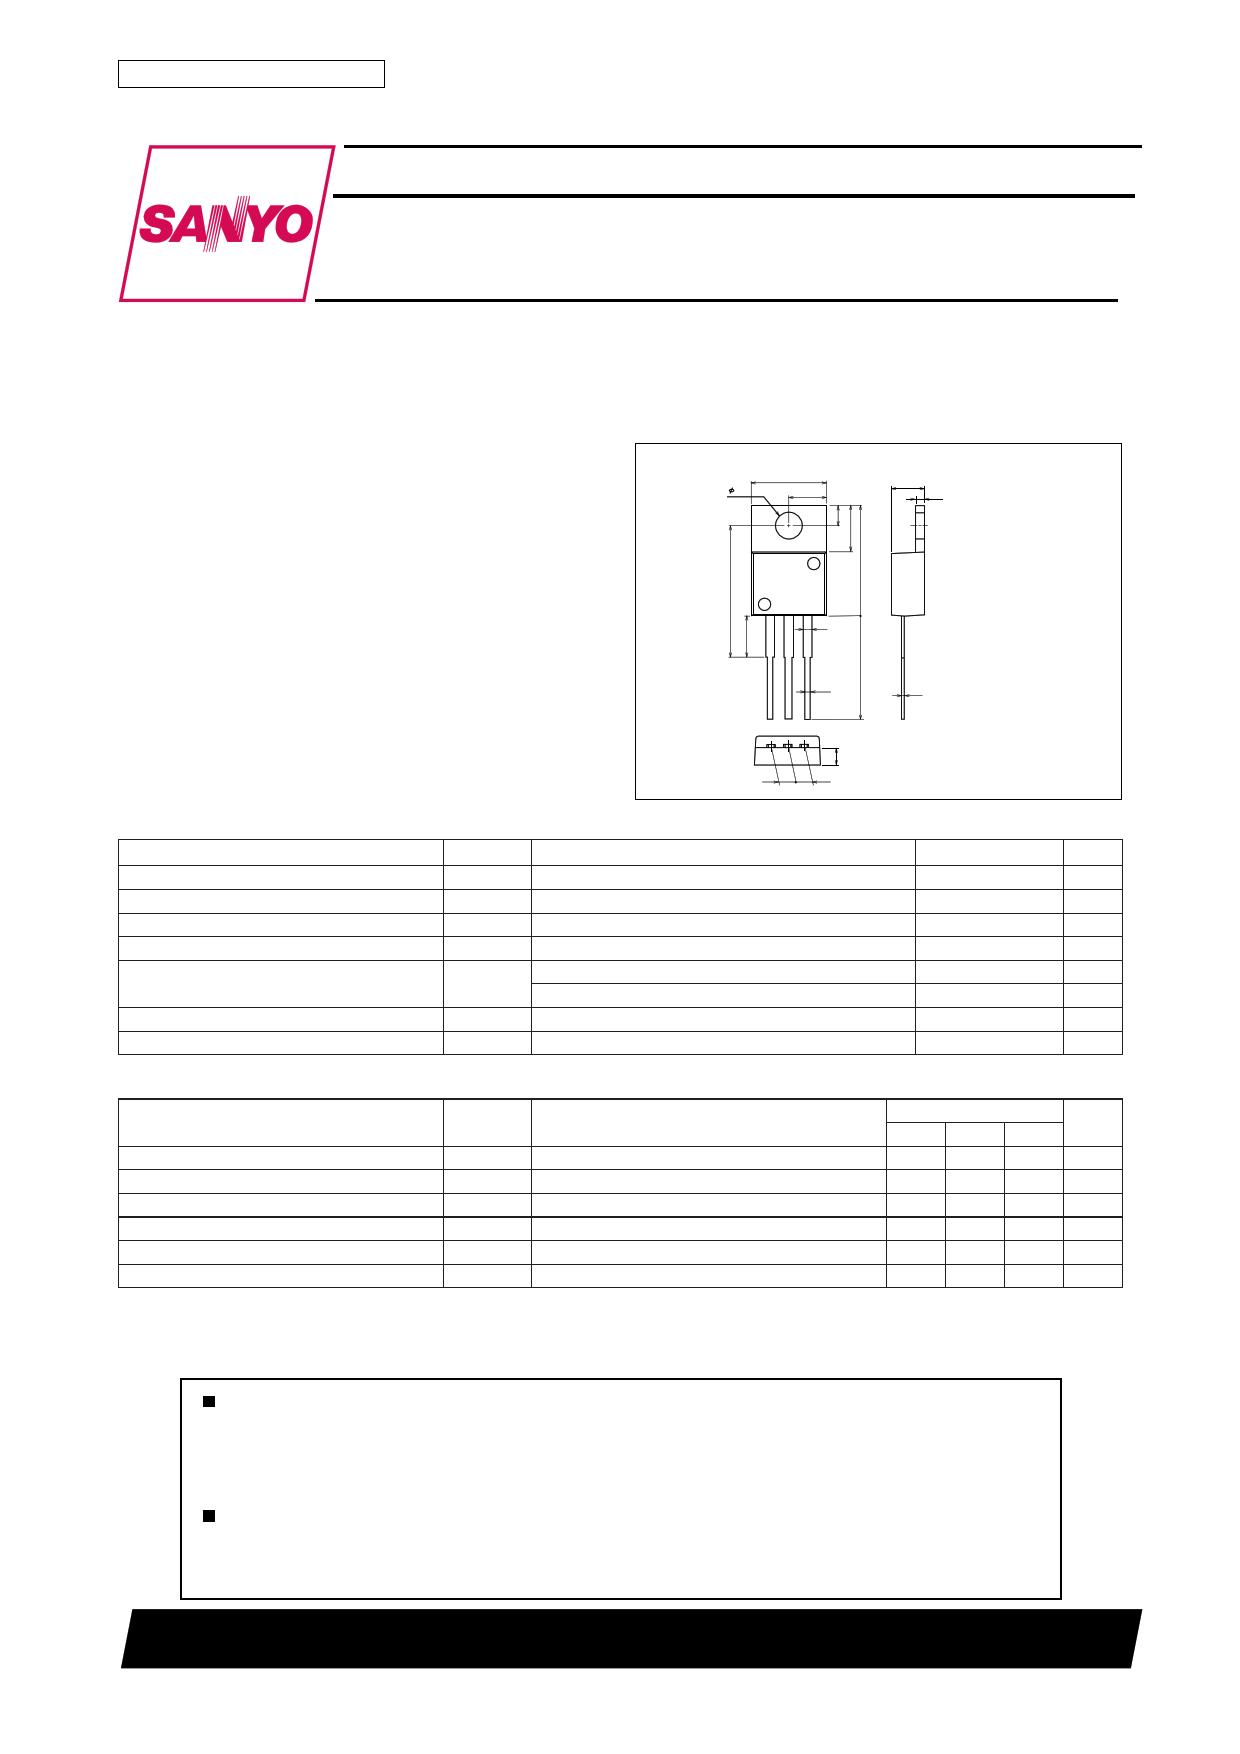 K1053 datasheet